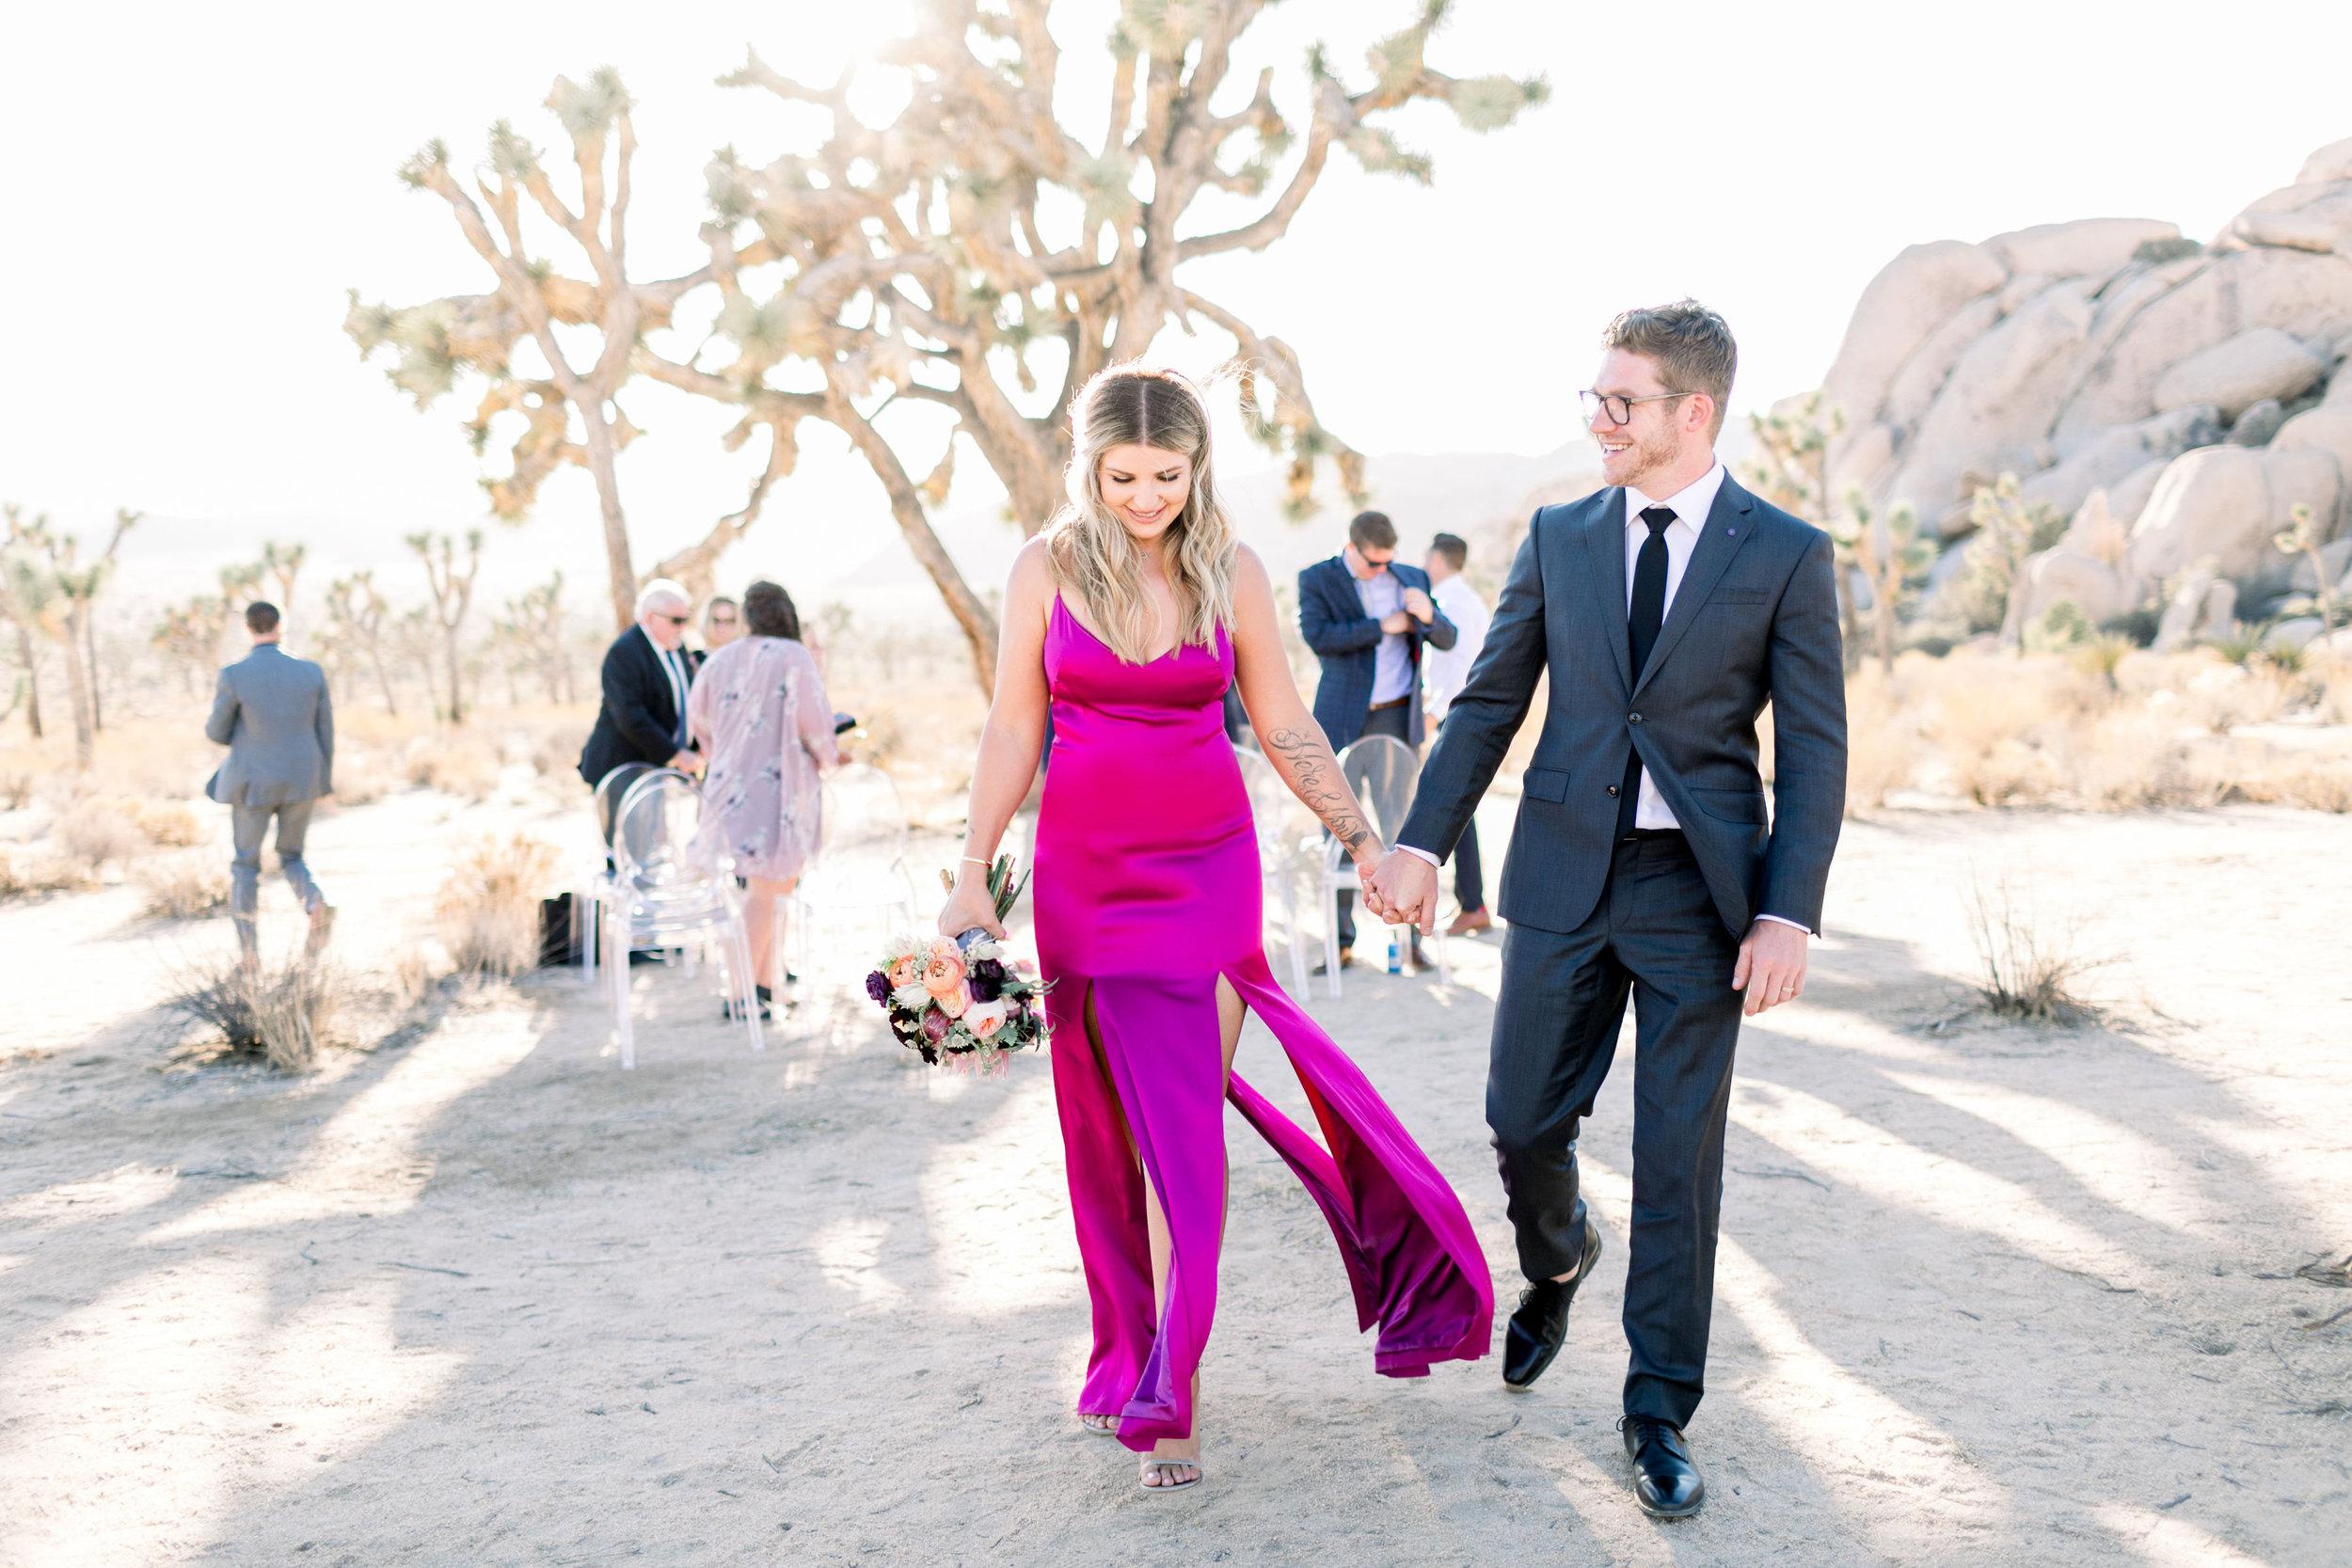 Joshua Tree Elopement Photographer- L'Horizon Palm Springs Wedding